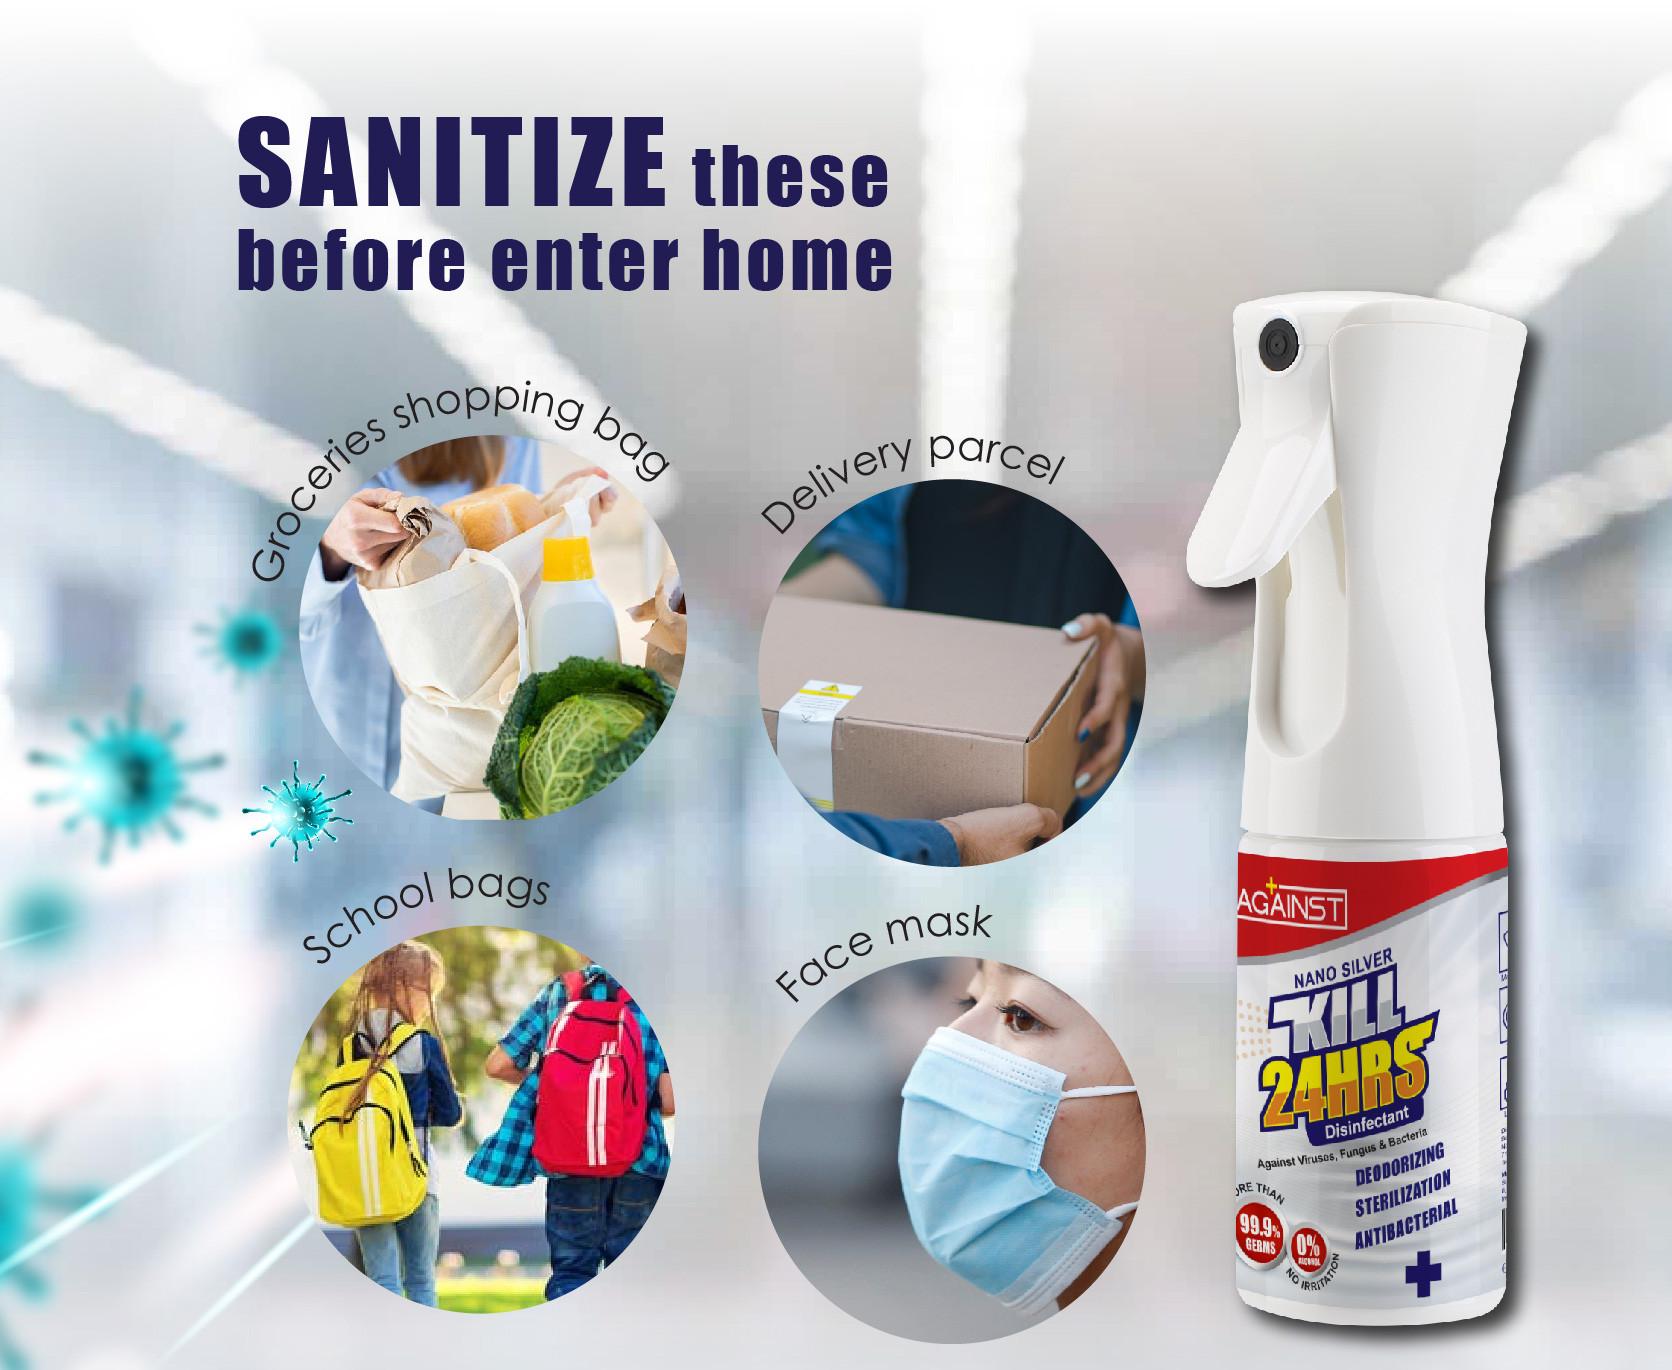 against nano silver disinfectant POSM-04